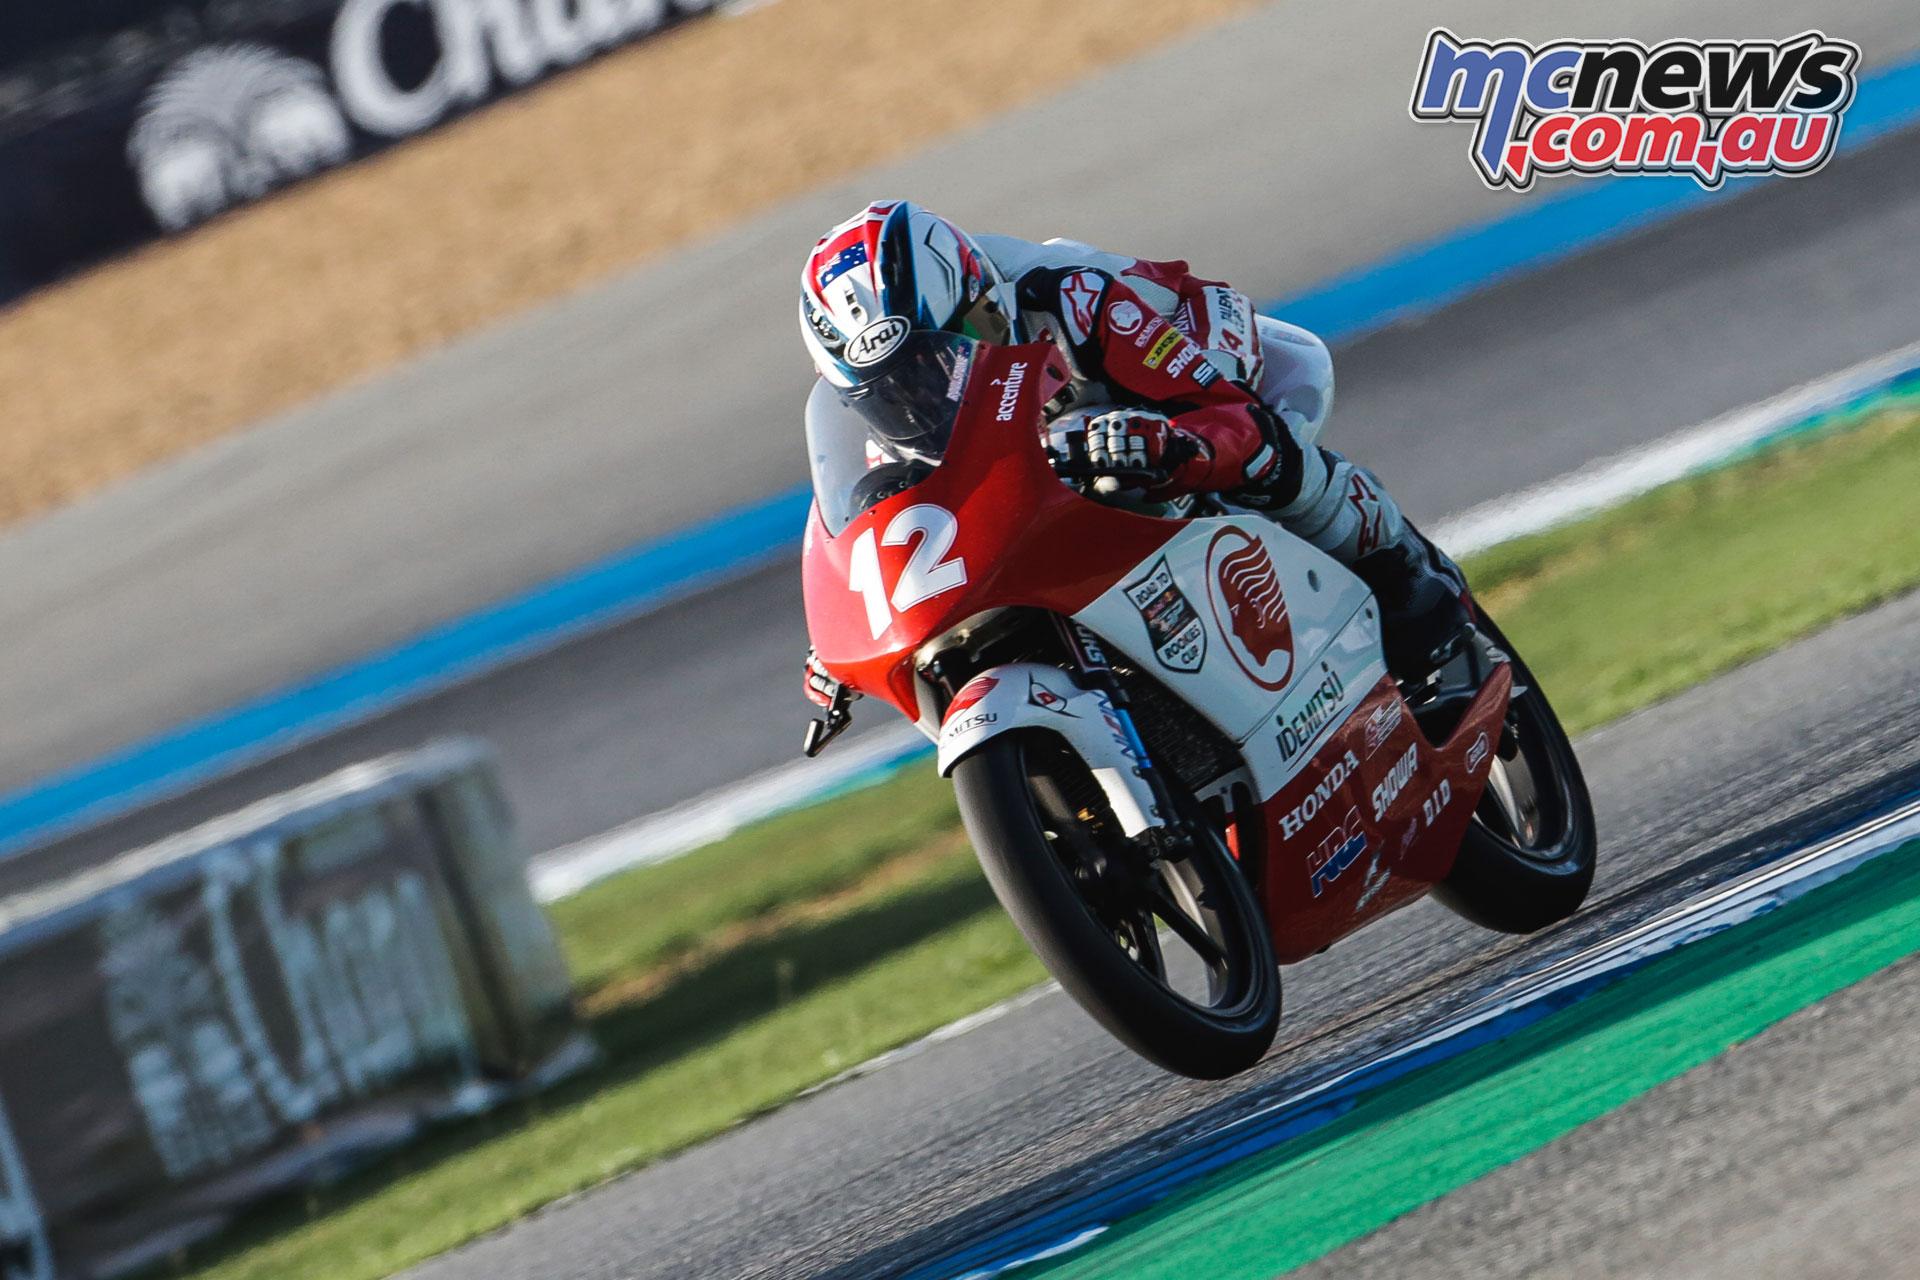 ATC Rnd Thailand Jacob Roulstone Race ZA